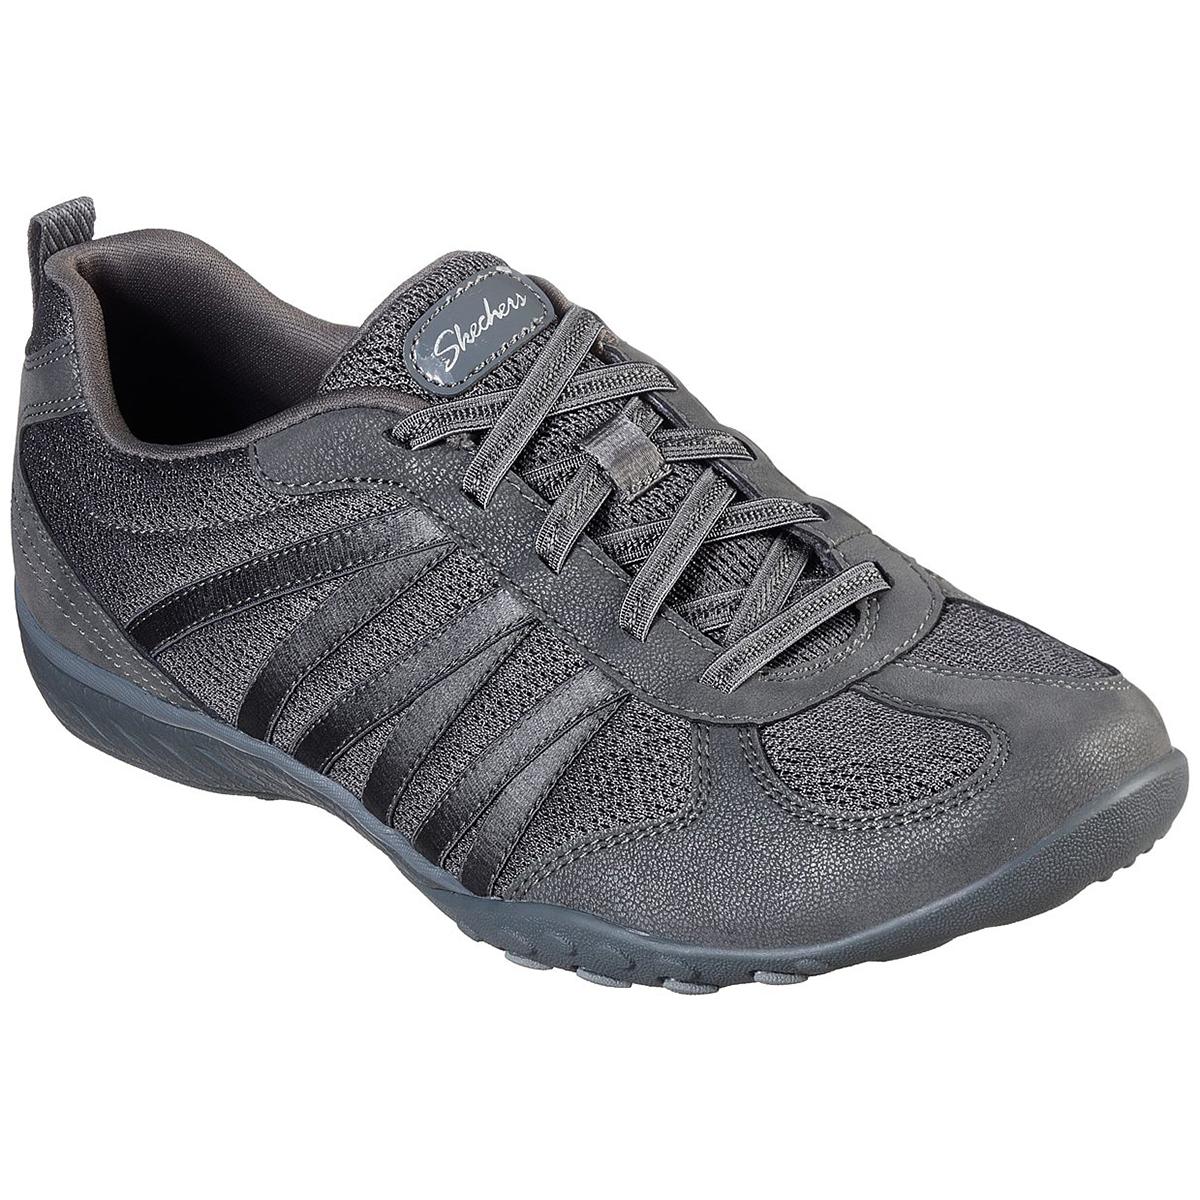 Skechers Women's Breathe Easy Be Relaxed Knit Slip On Shoes - Black, 7.5